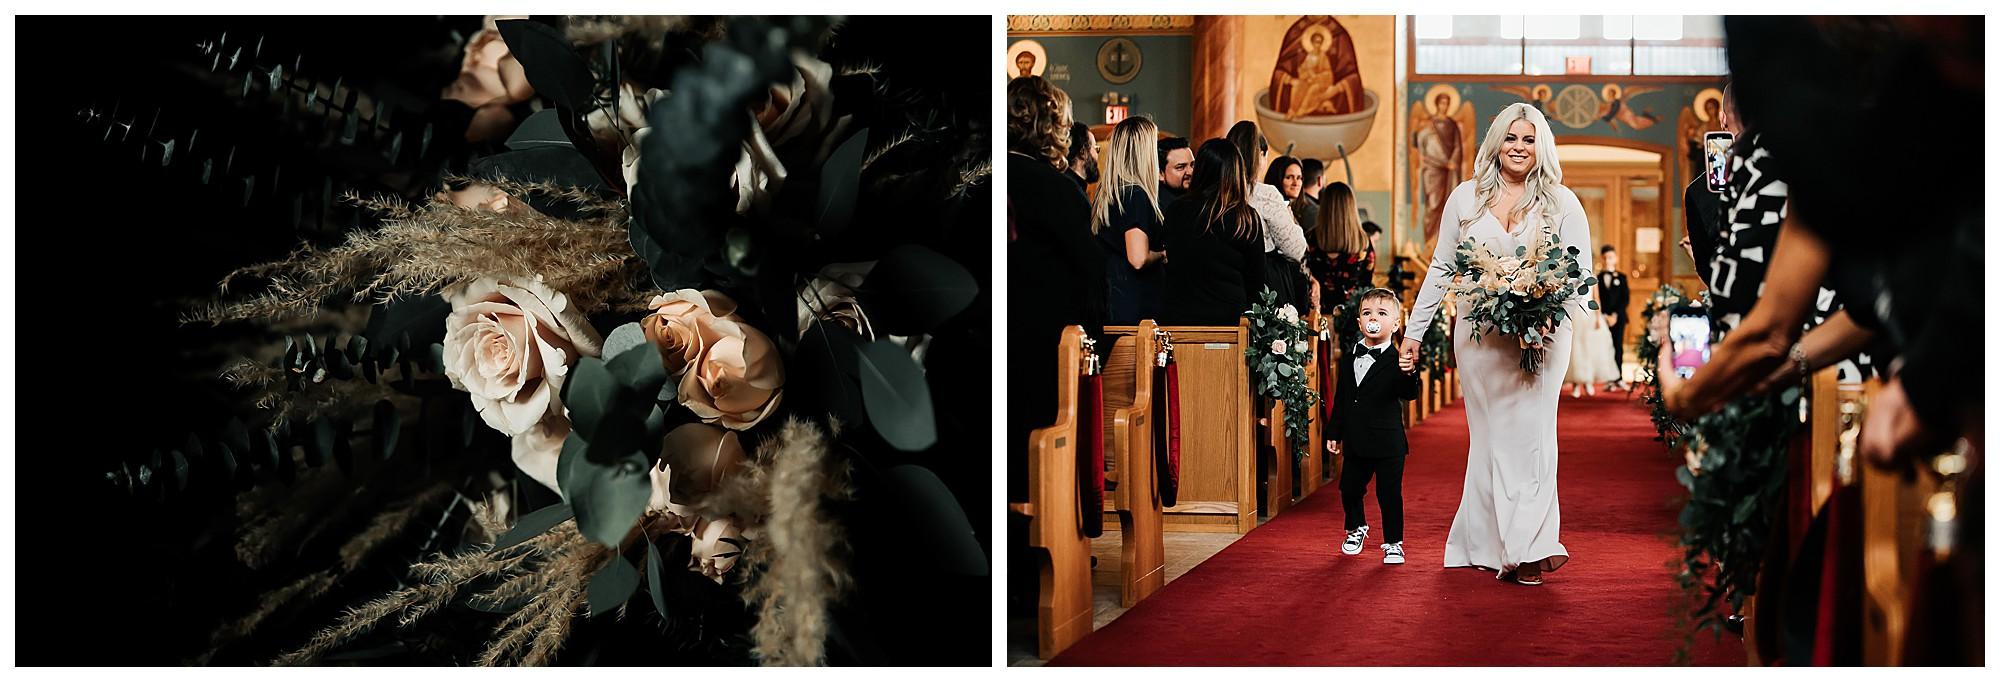 Joanna-Christos-Grand-Luxe-Wedding-Photos-Mint-Room-Toronto-VanDaele-Russell_0070.jpg